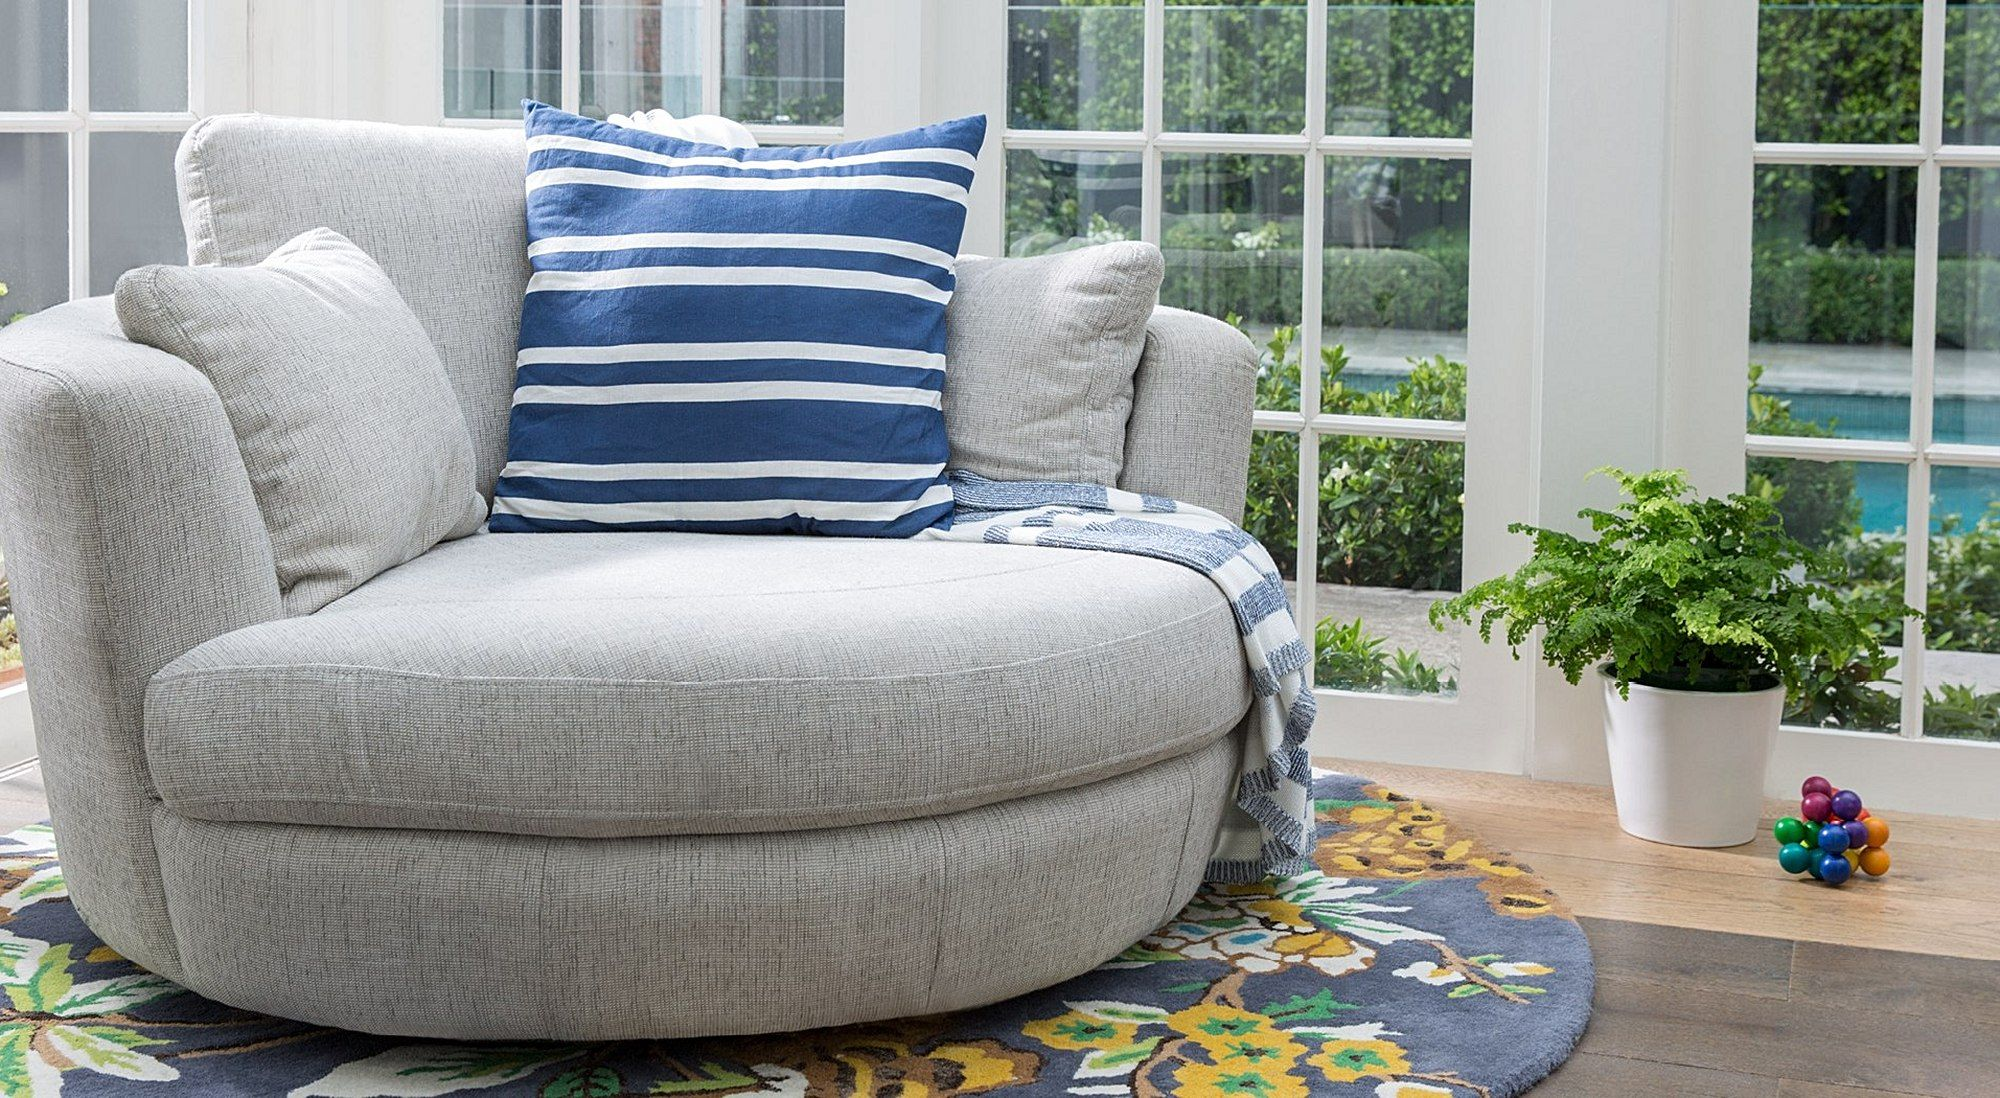 Sensational Snuggle Chair Decorating Cuddle Chair Sofa Furniture Bralicious Painted Fabric Chair Ideas Braliciousco